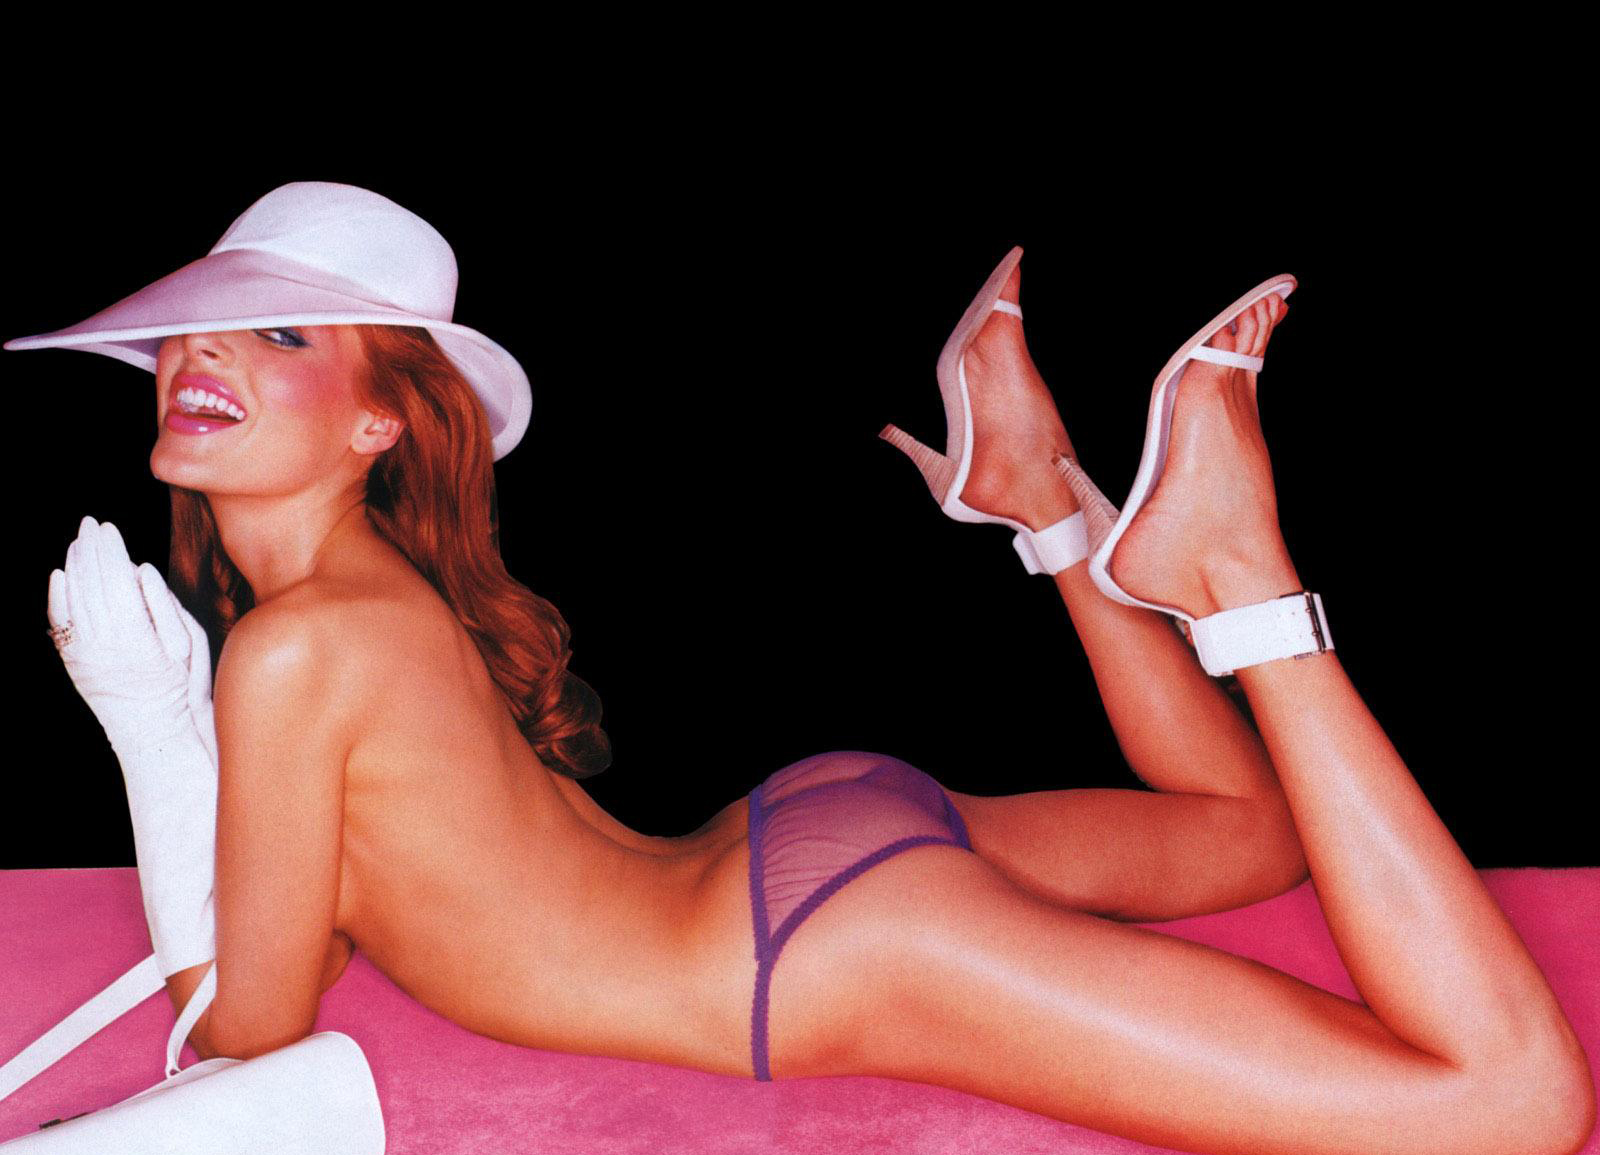 http://1.bp.blogspot.com/-P5jZrklt2yM/T36Z6VnamUI/AAAAAAAAGOA/AWn1I99PYCc/s1600/Gisele+Caroline+Feet+Photo++-2.jpg